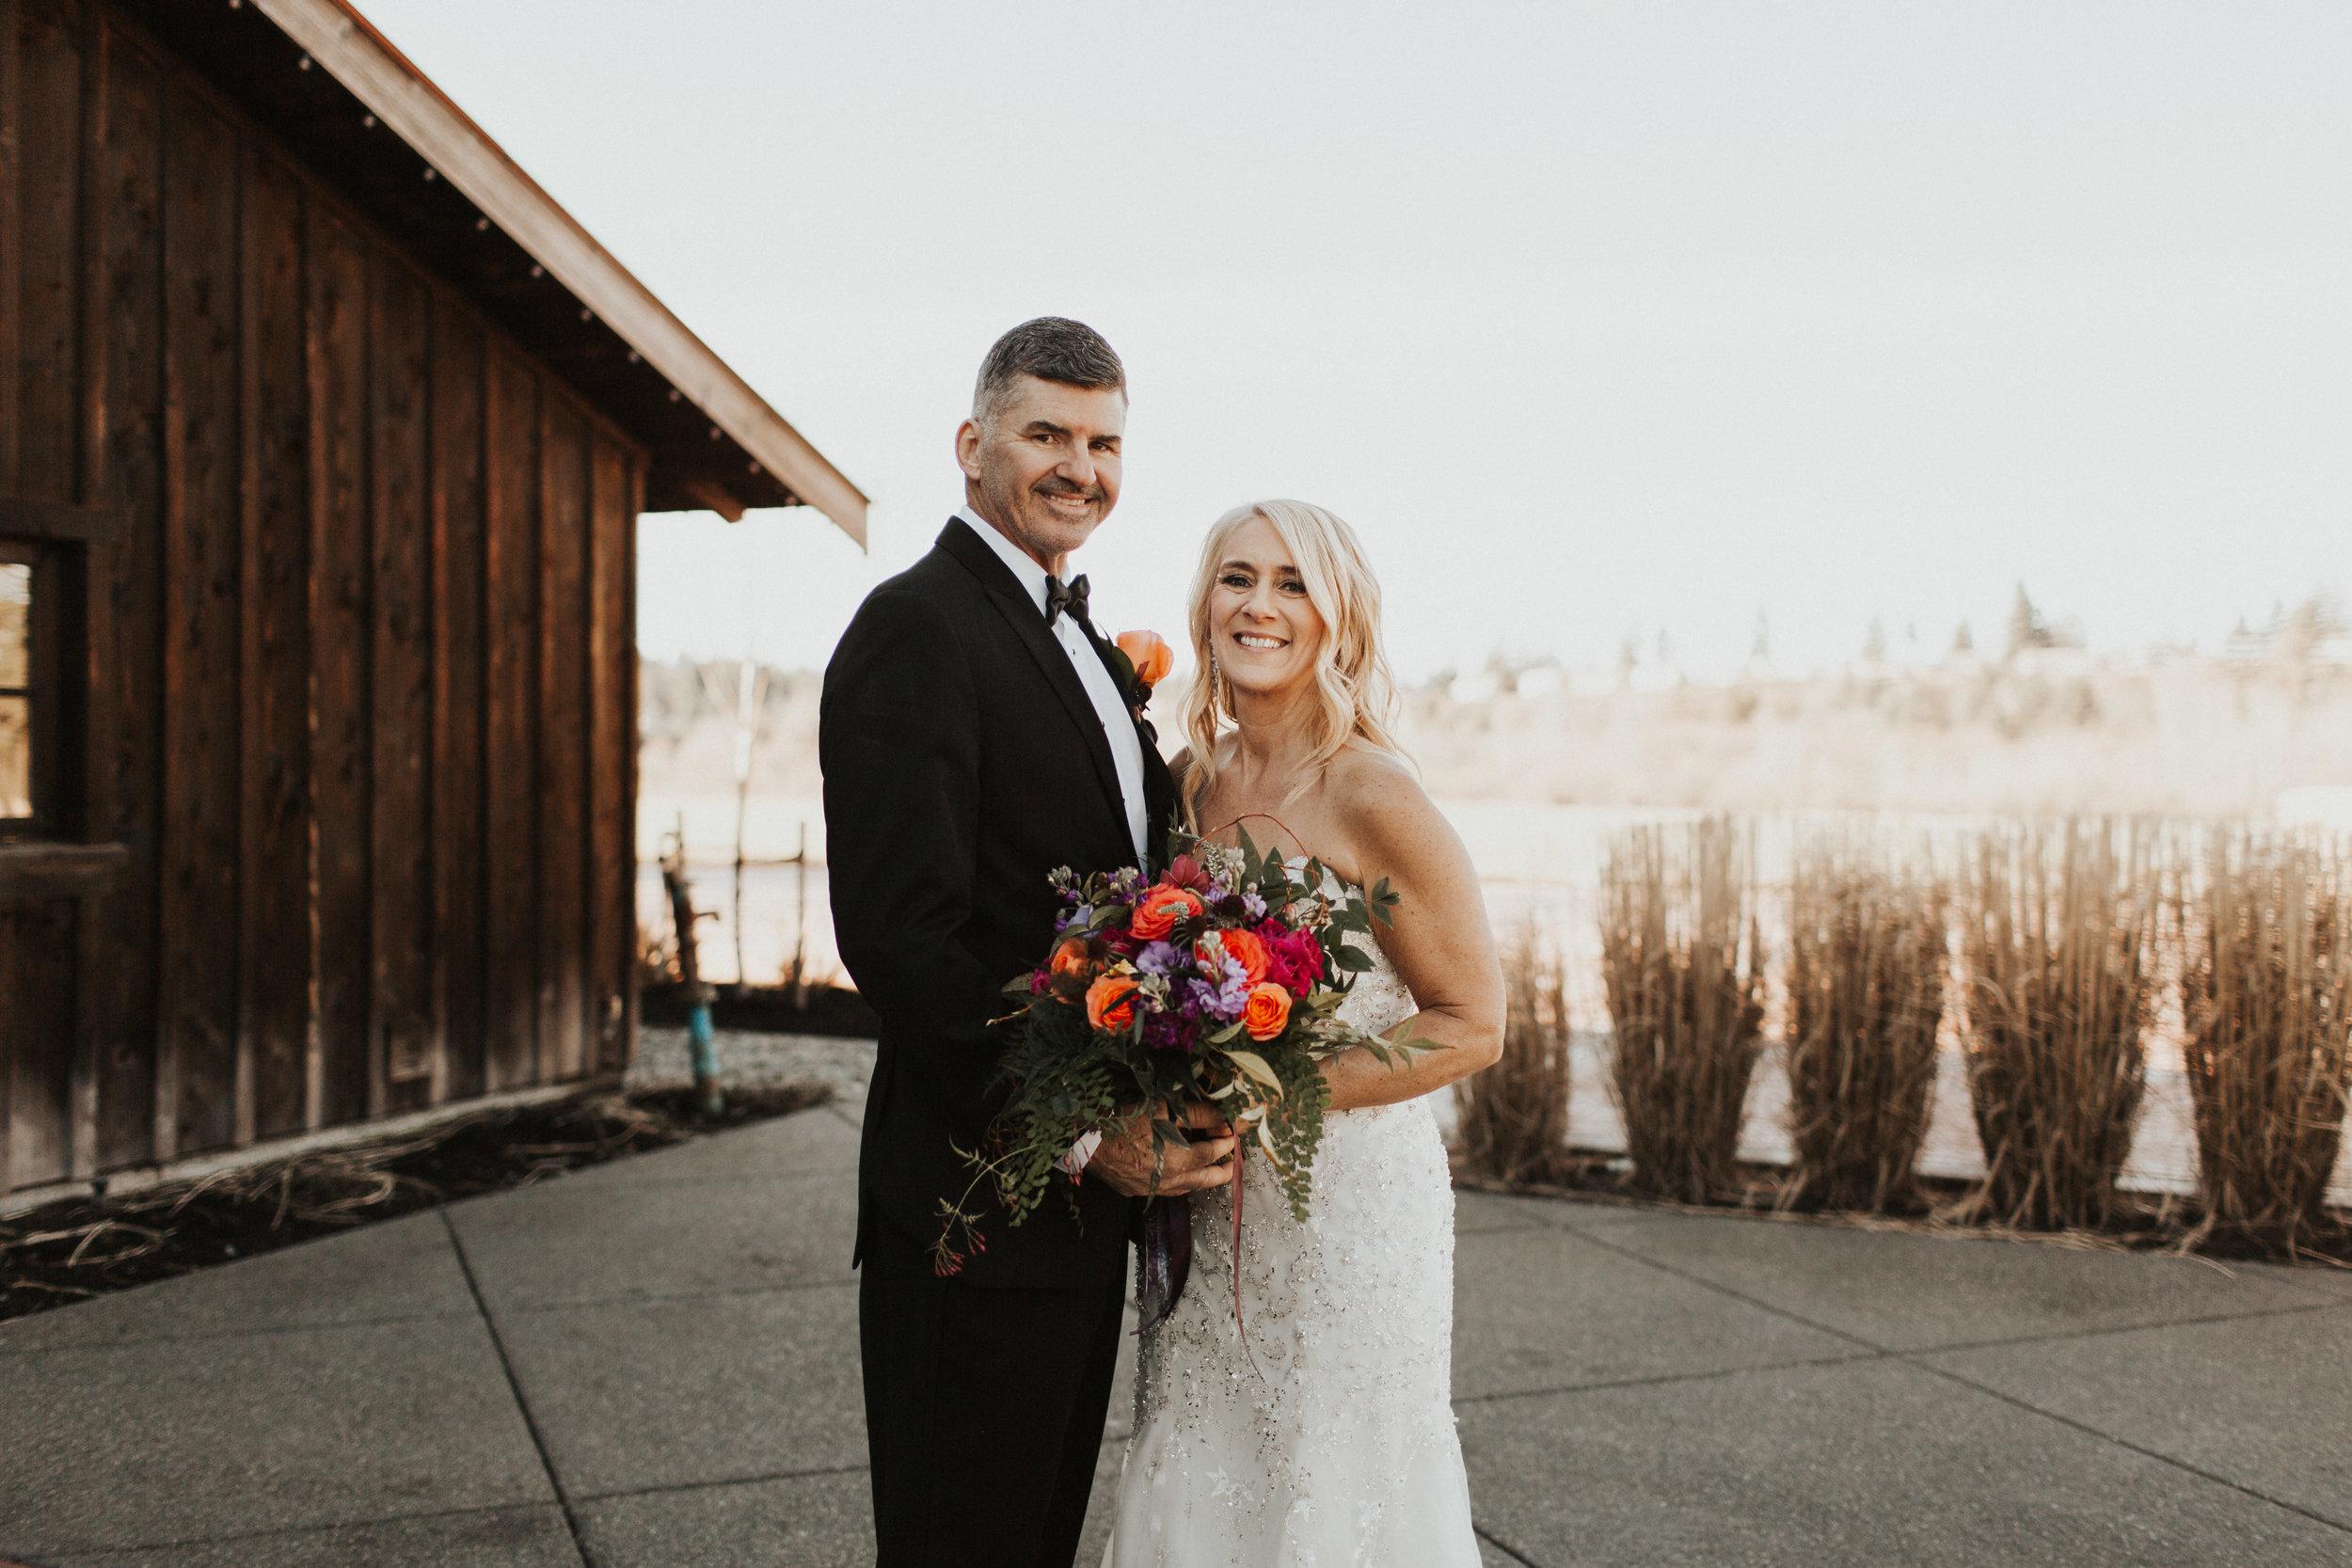 ginapauslon_deenateel_wedding-301.jpg